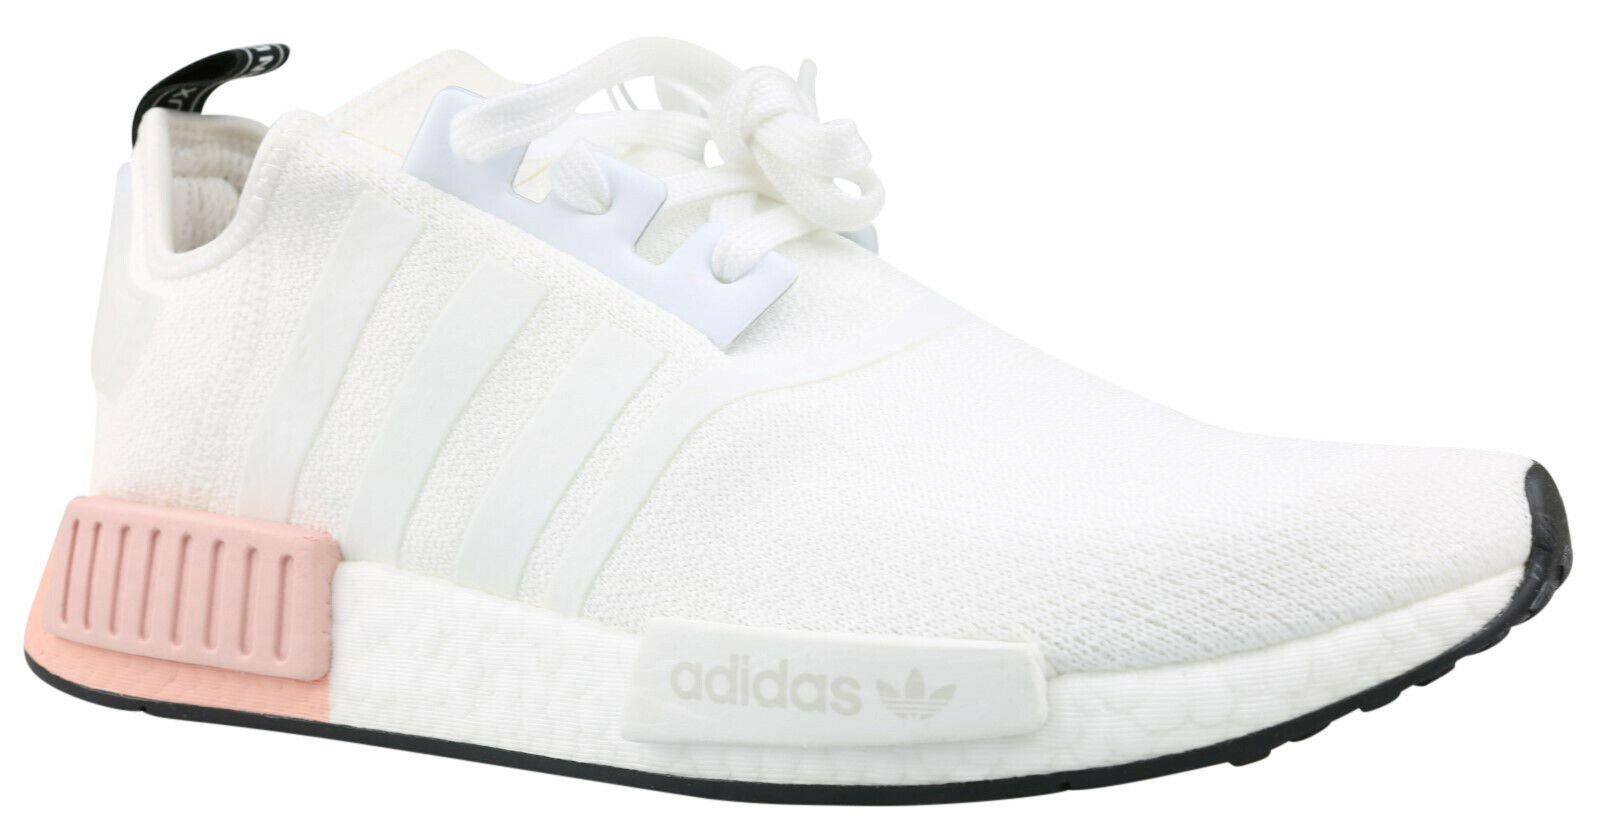 alquiler Disipación doce  Adidas NMD R1 Herren Sneaker Turnschuhe Schuhe EE5109 weiß pink Gr. 38 - 47  NEU en 2021 | Adidas nmd_r1, Nmd r1, Adidas